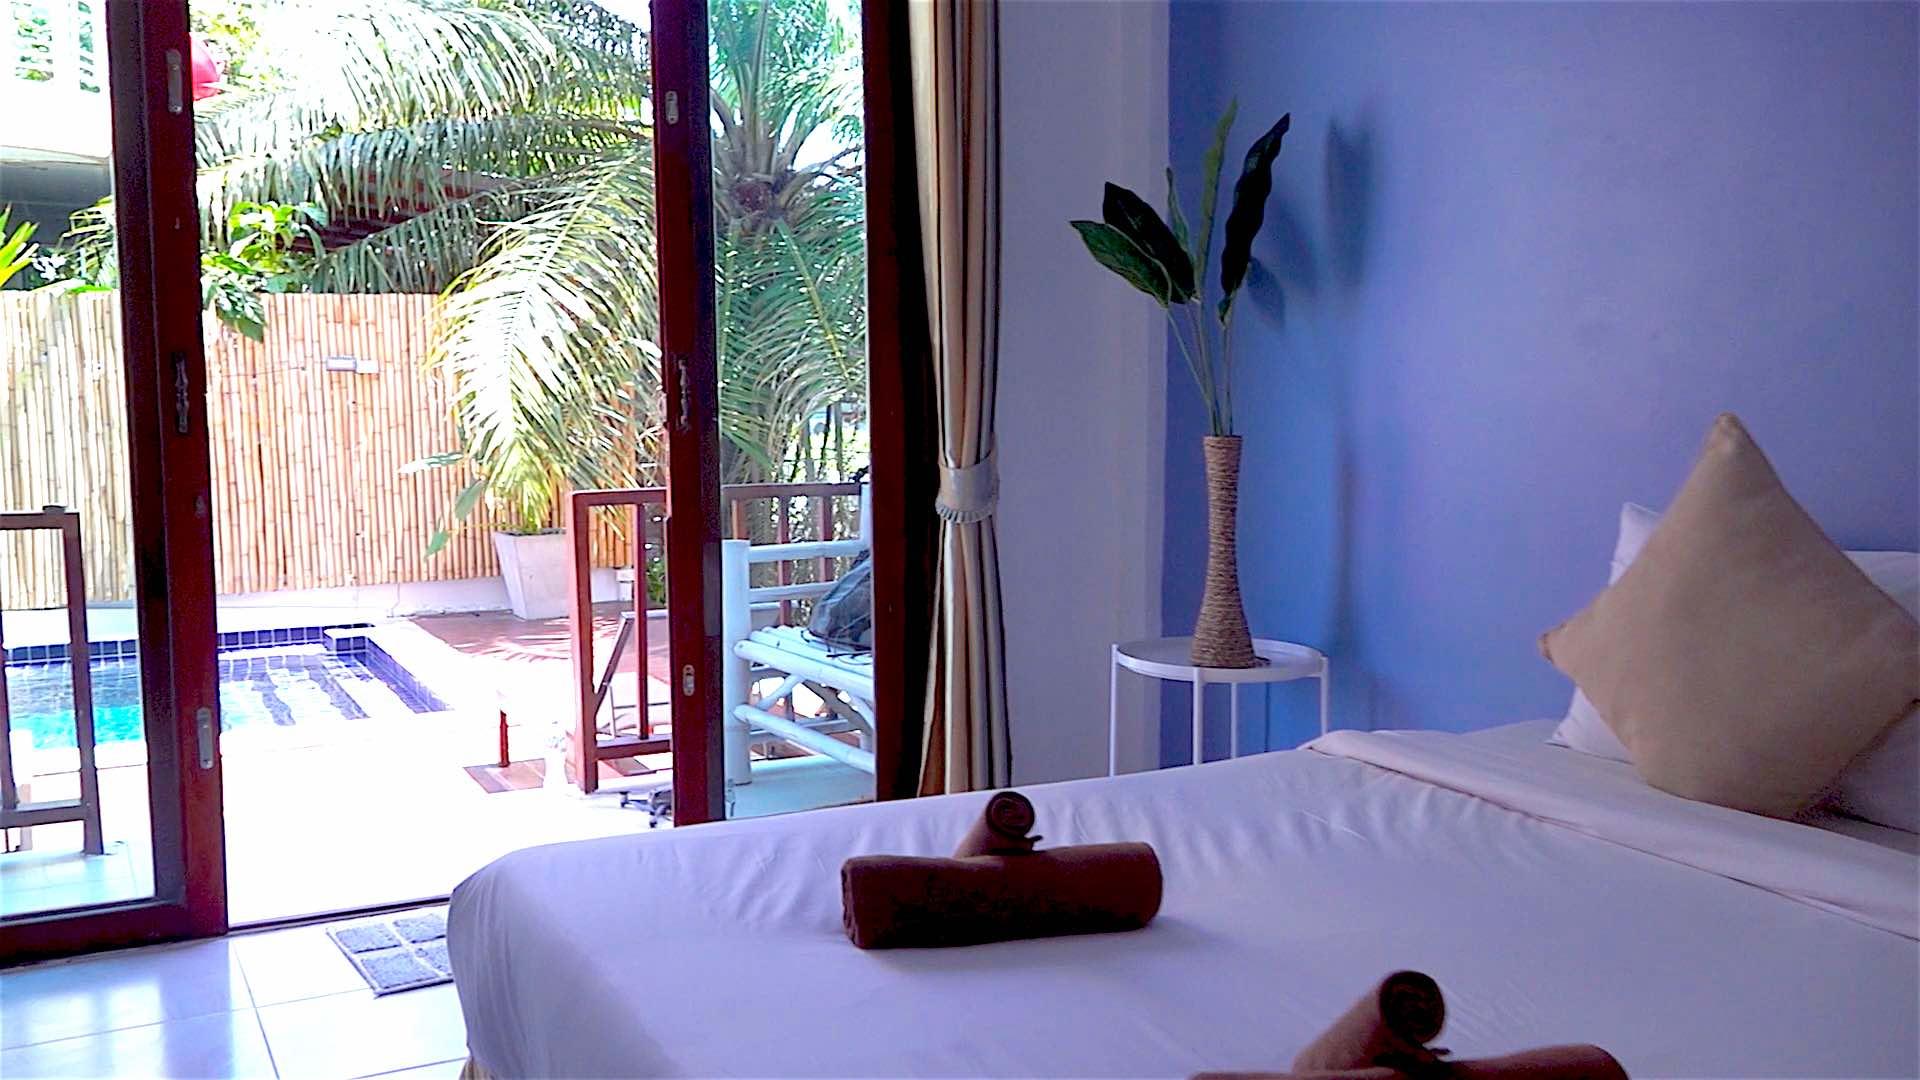 www.thefunkyturtle.com hakuna matata hostel koh tao private rooms